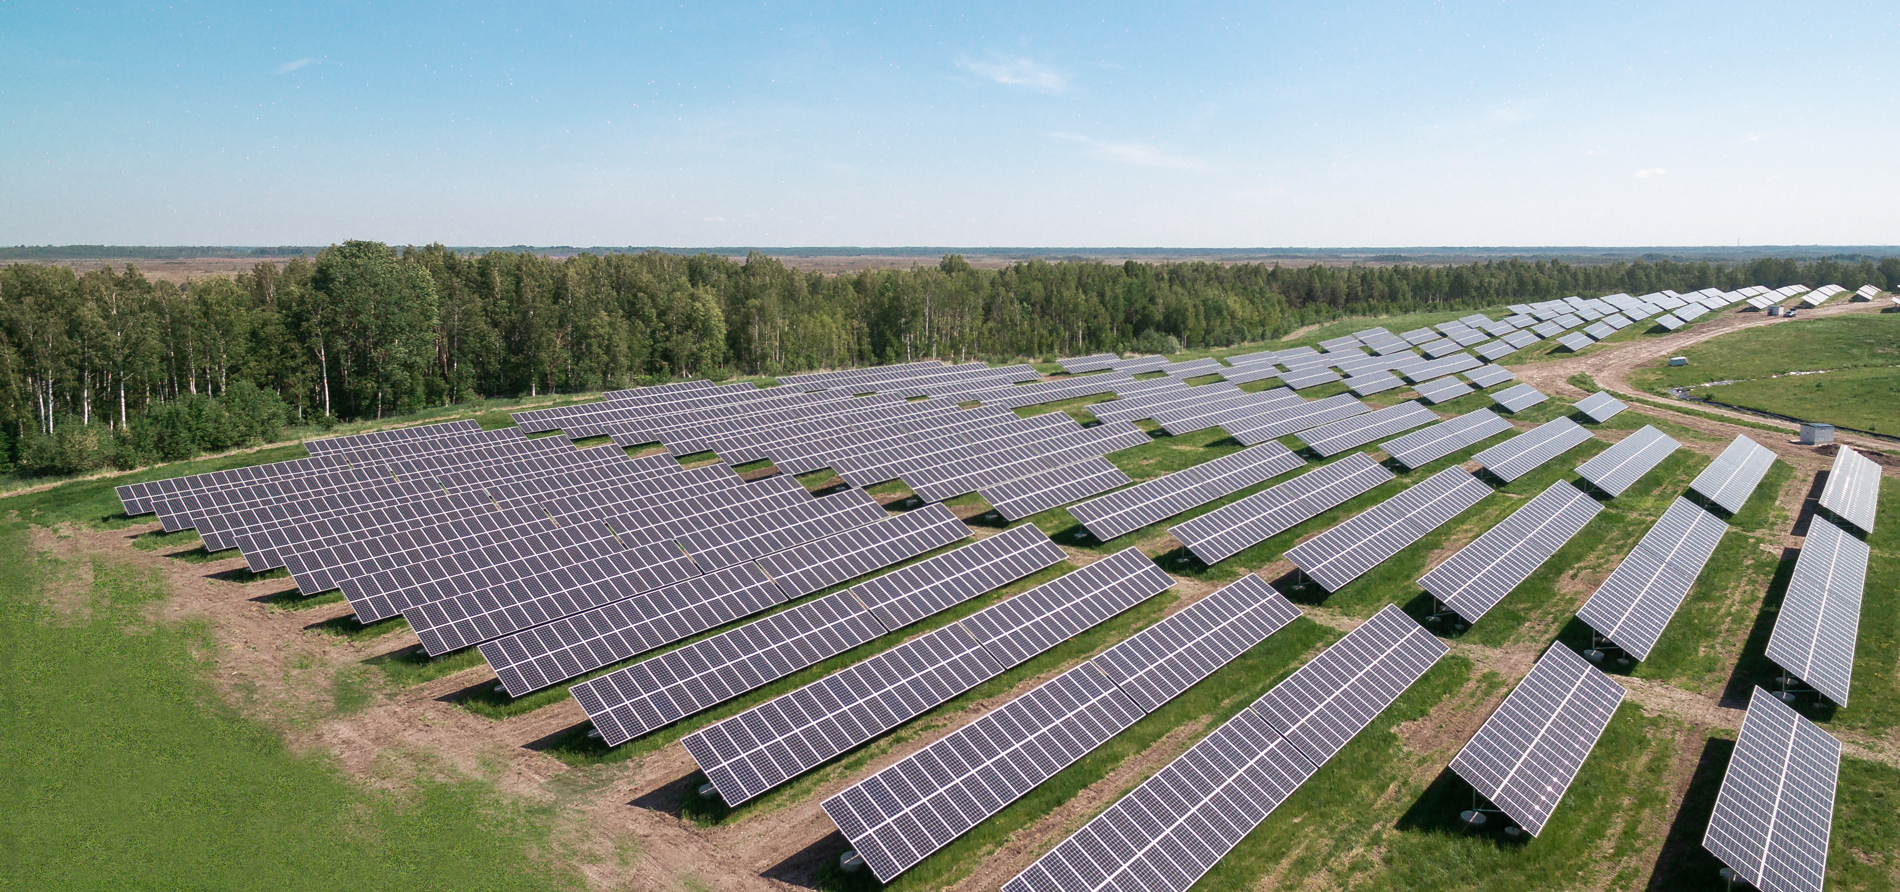 Elenger solar power complex in Pärnu, Estonia